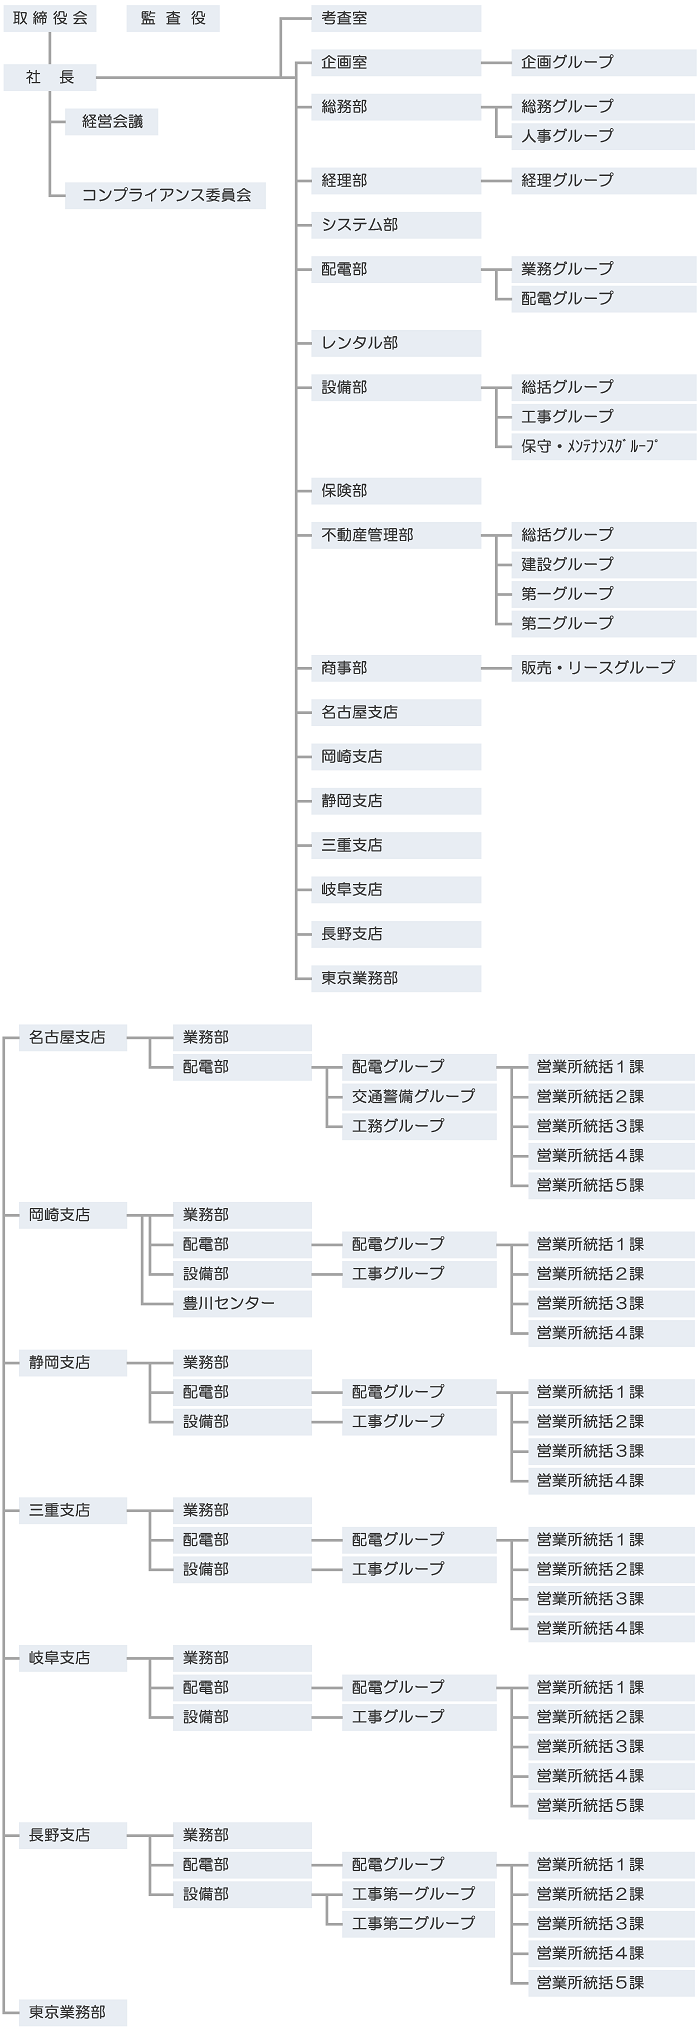 組織図_20210701.png